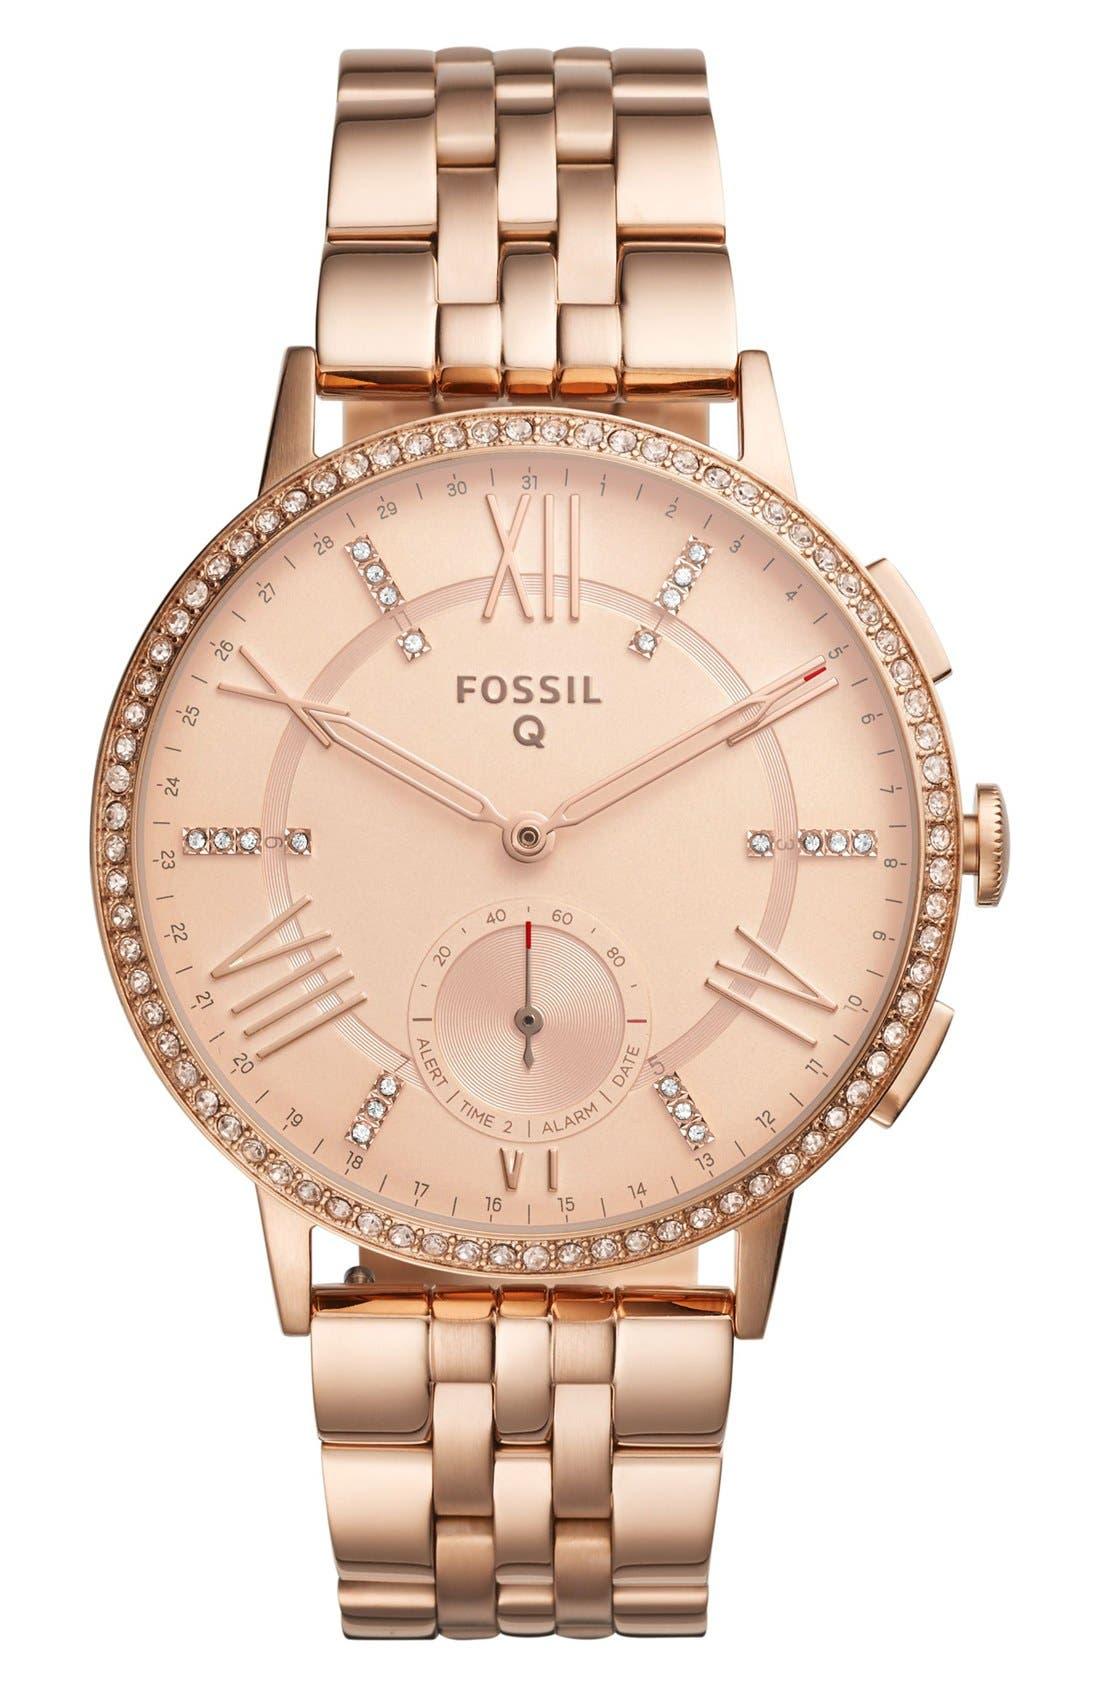 Main Image - Fossil Q Gazer Hybrid Smart Bracelet Watch, 41mm